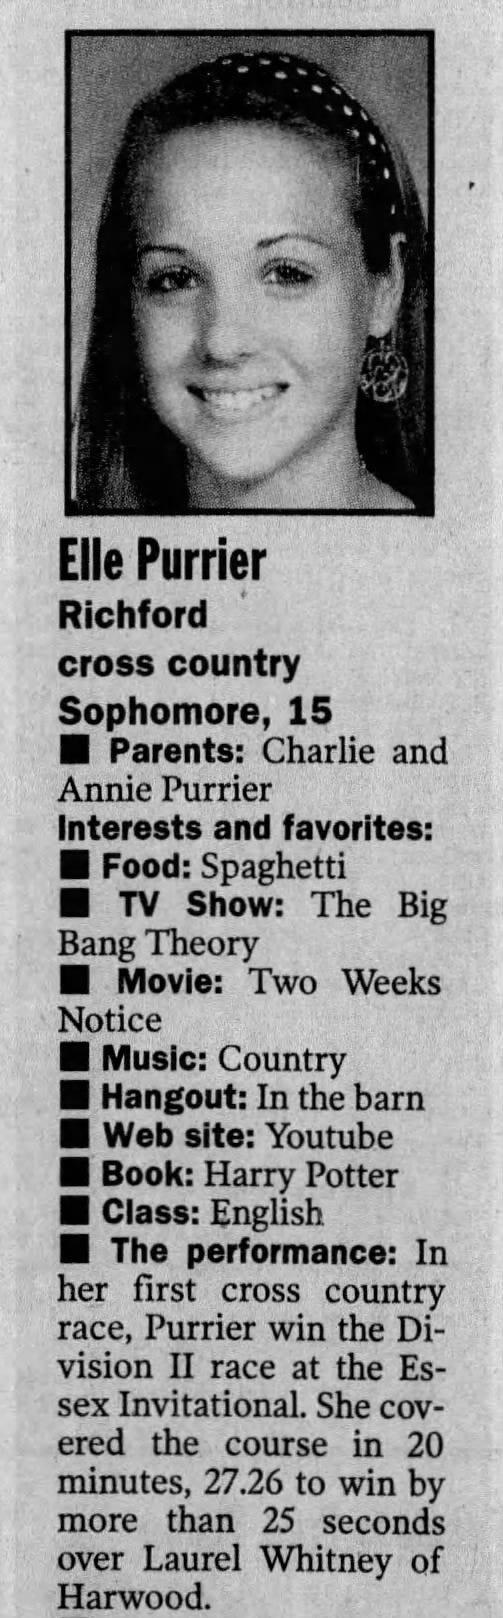 Elle Purrier St. Pierre was the Burlington Free Press' girls athlete of the week in Sept. 2010.